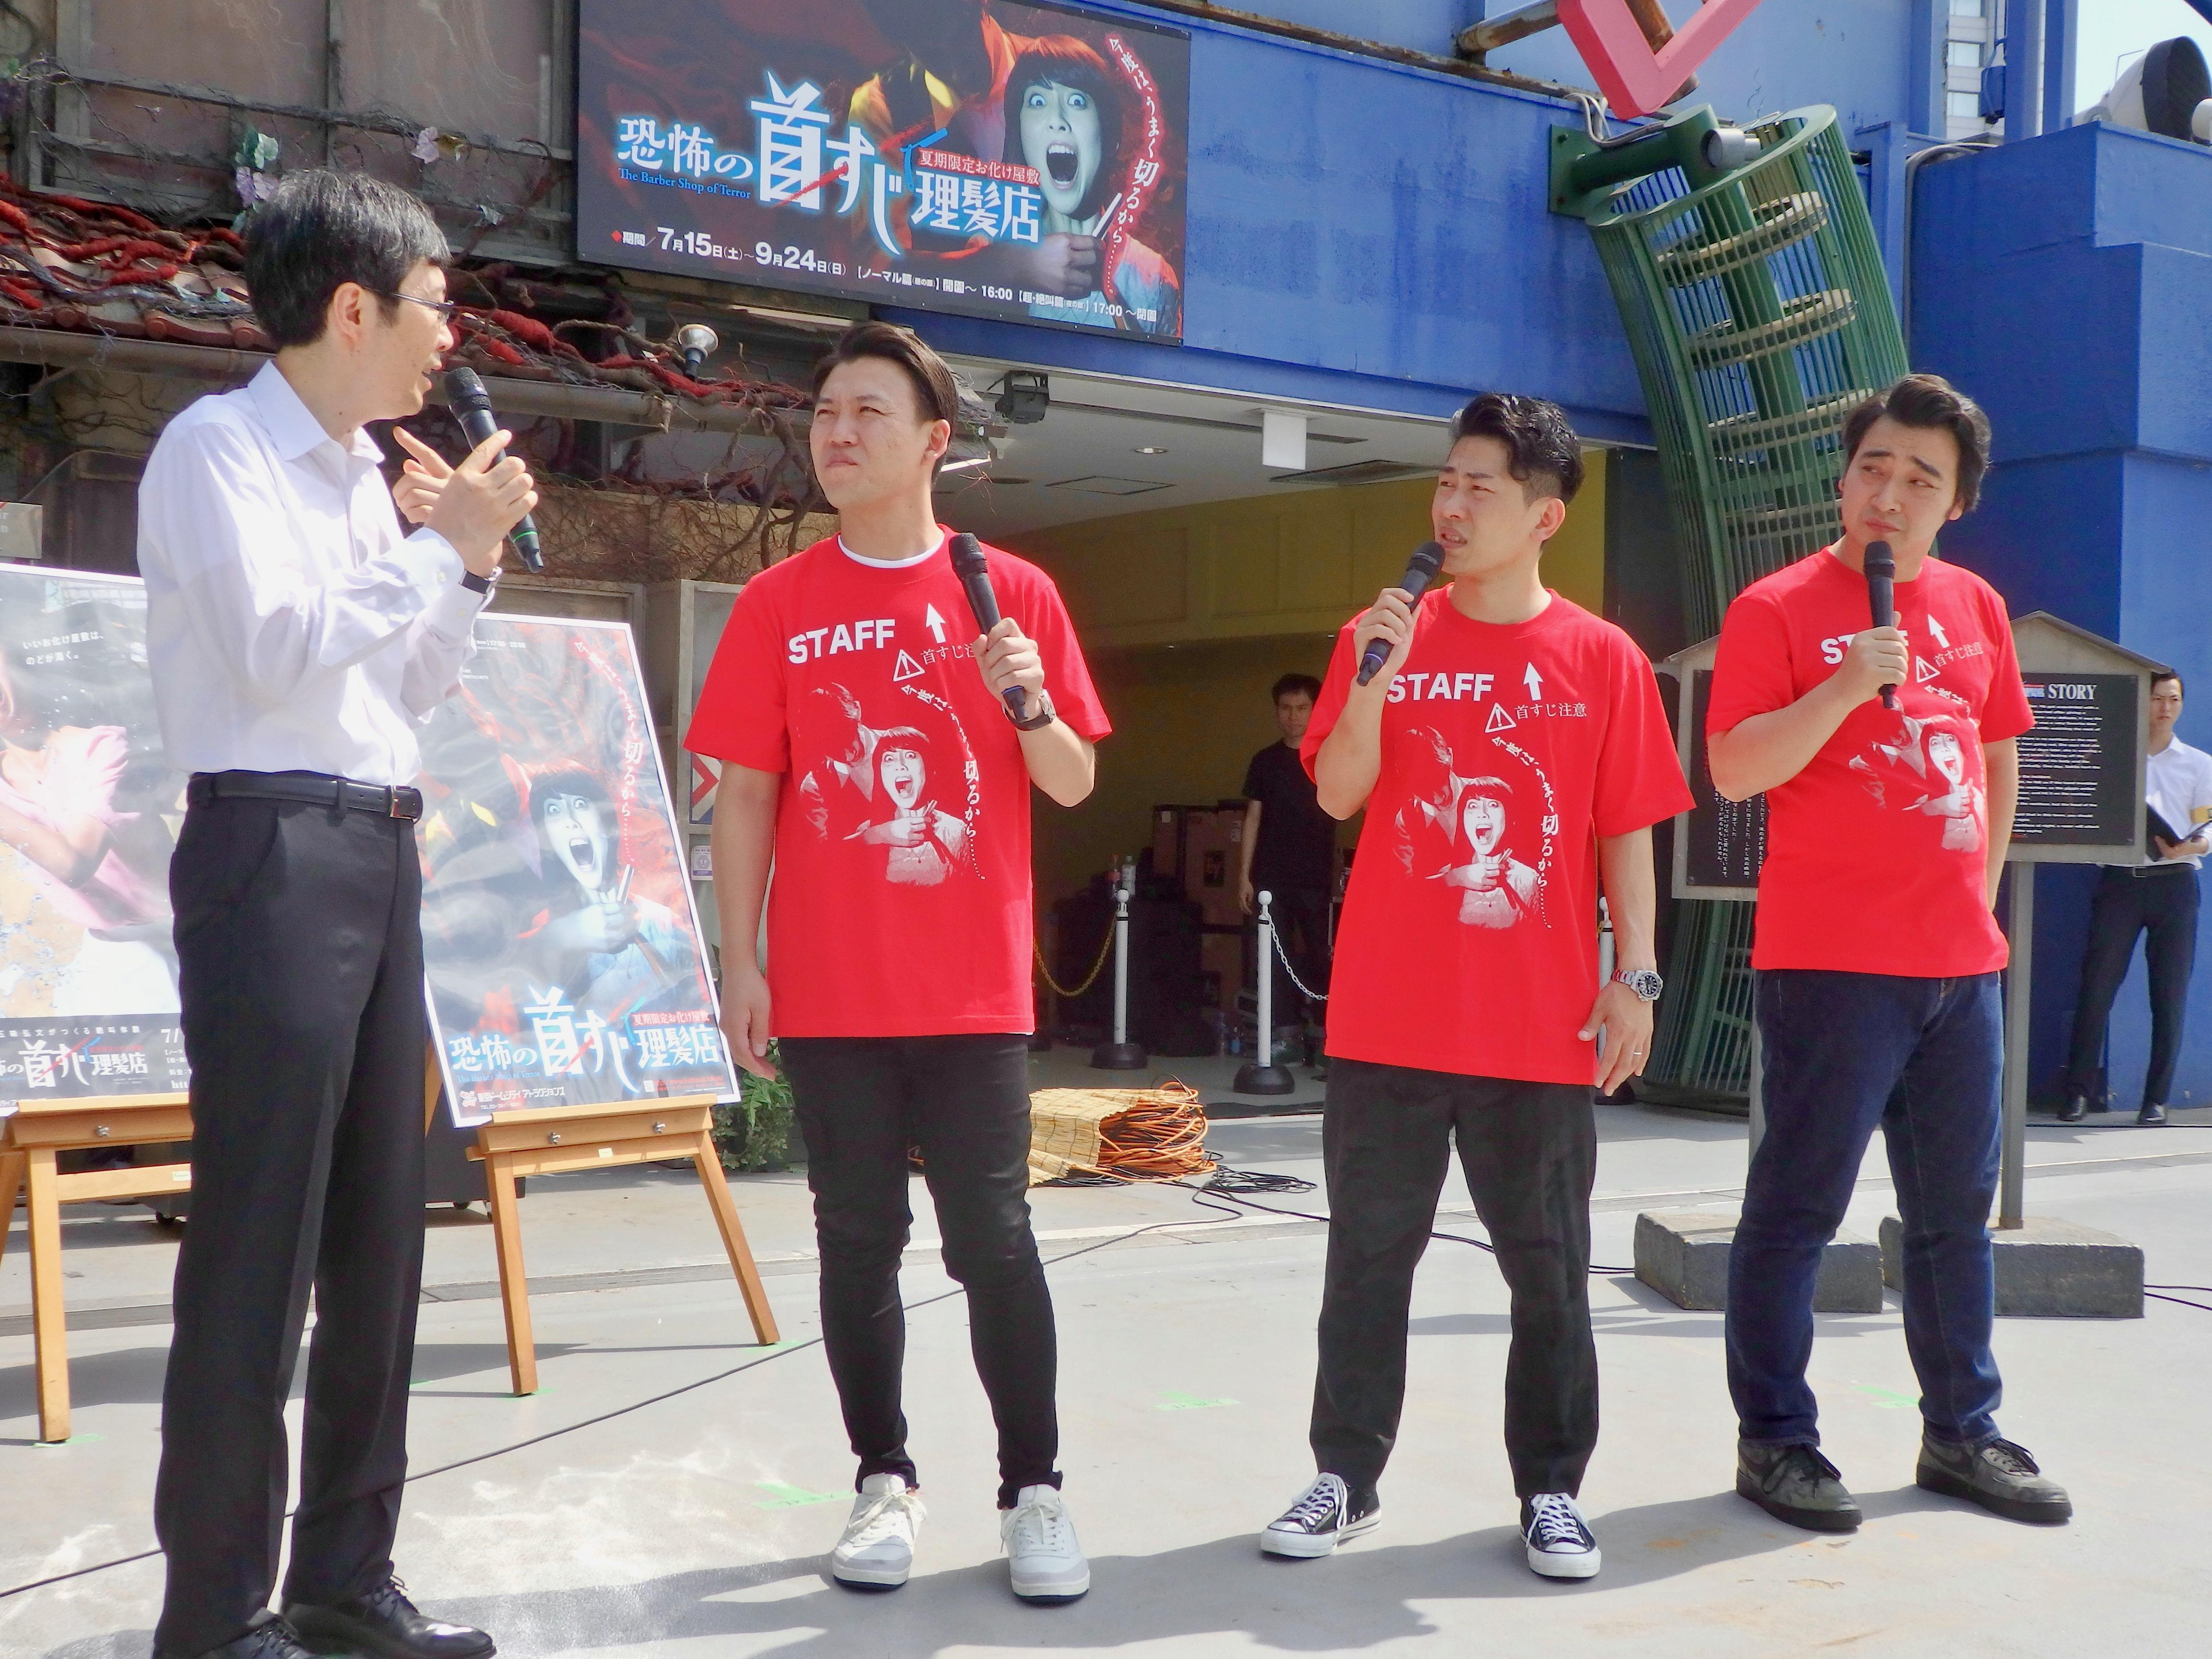 http://news.yoshimoto.co.jp/20170713055456-b06133c0754bff0bb1de6cf2010582f7149deb60.jpg